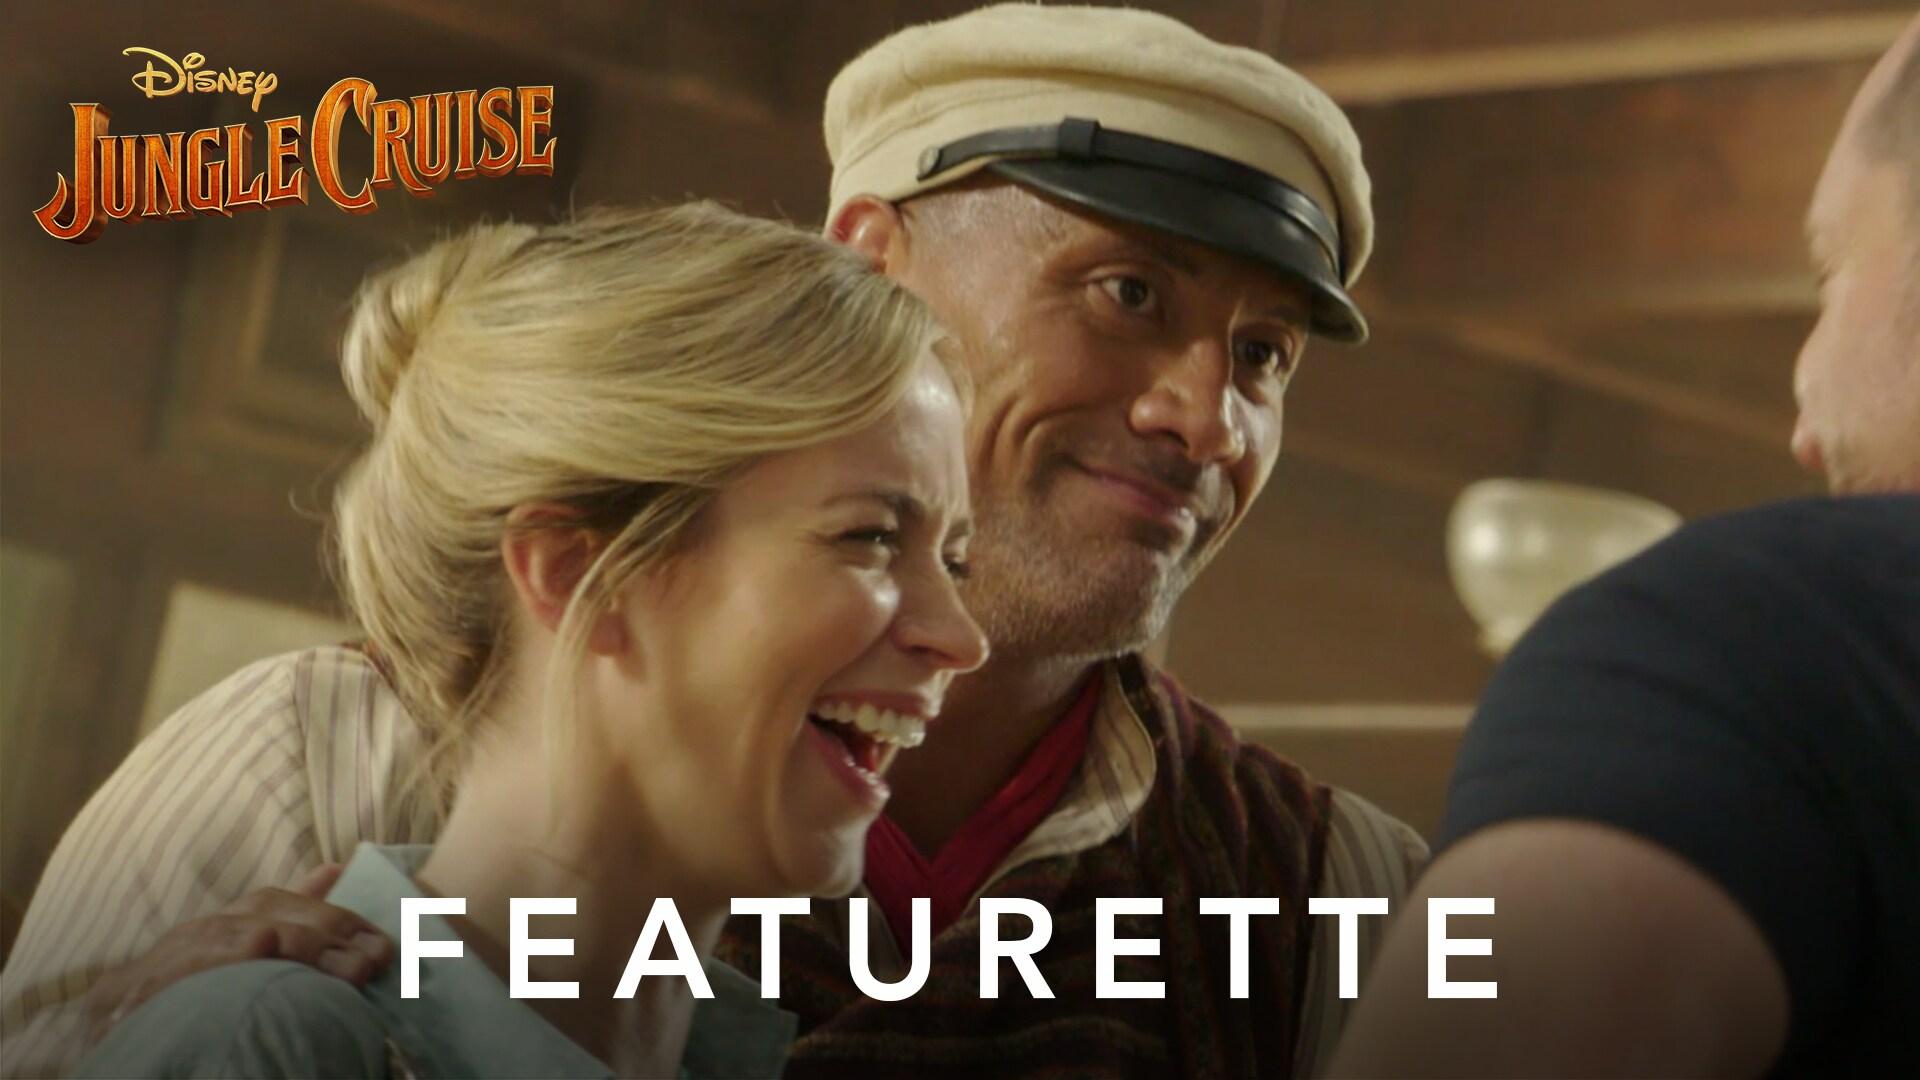 Big Adventure Featurette | Disney's Jungle Cruise